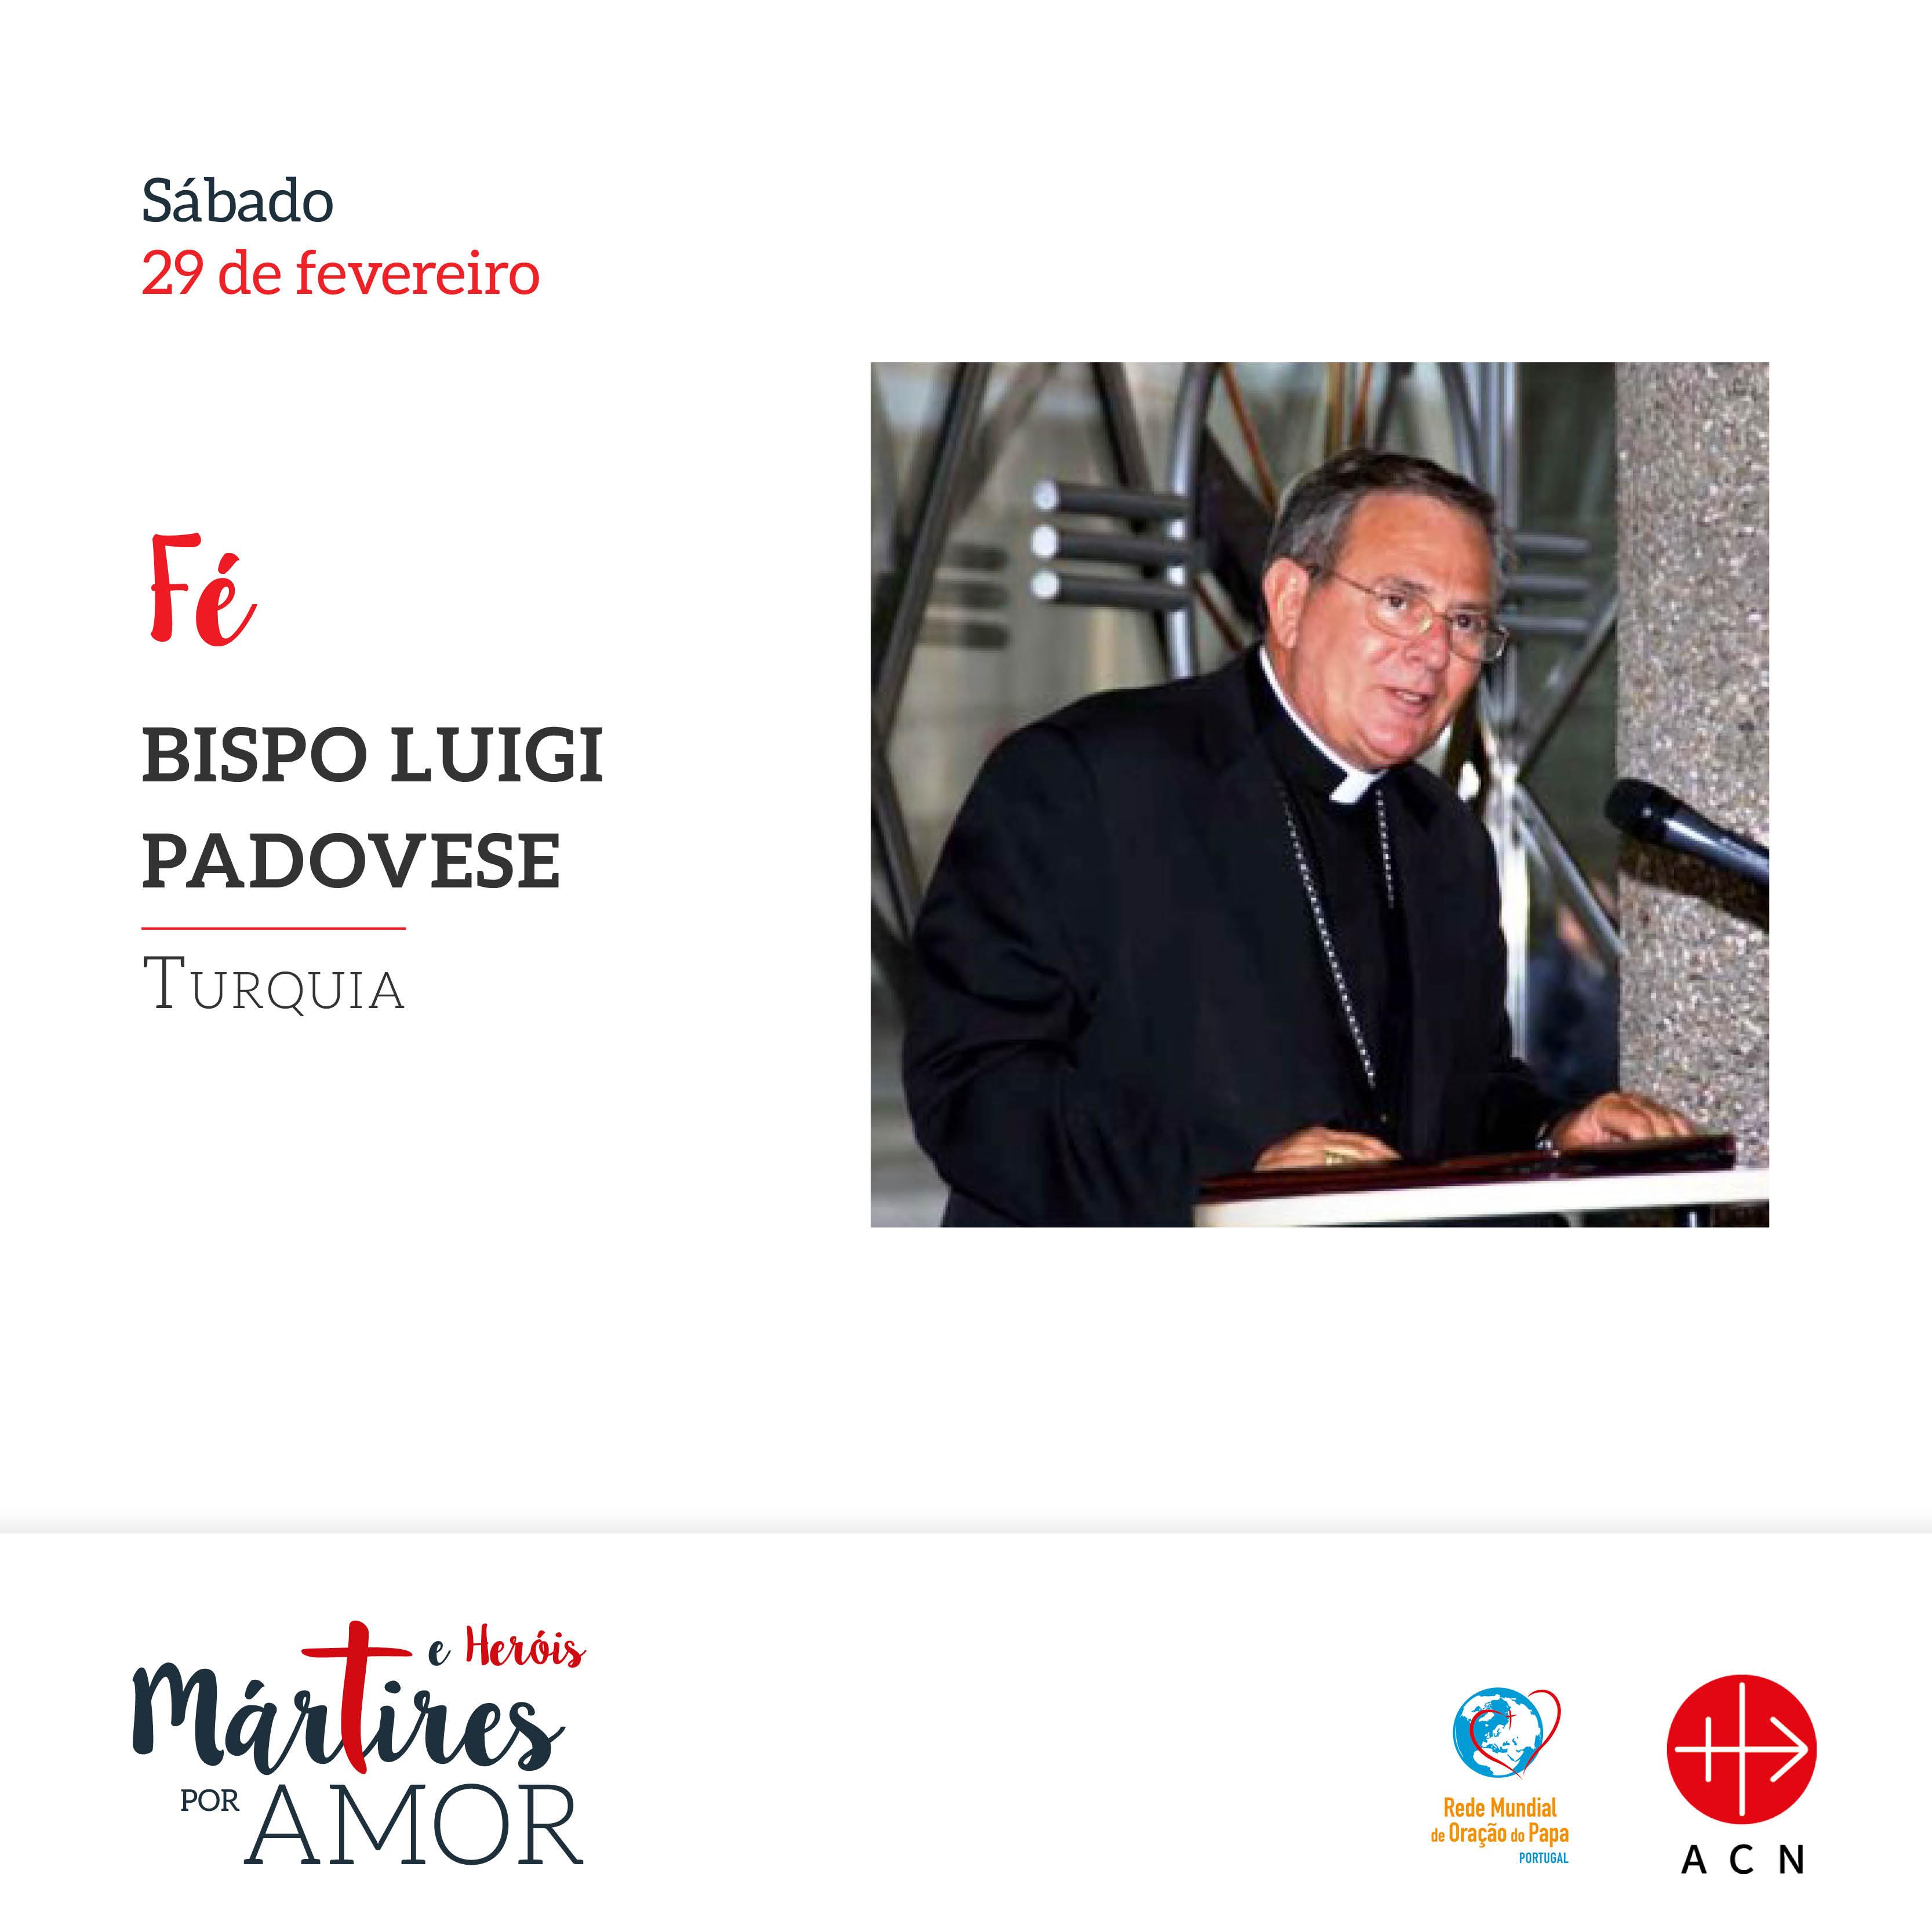 Fé - Turquia: Bispo Luigi Padovese.